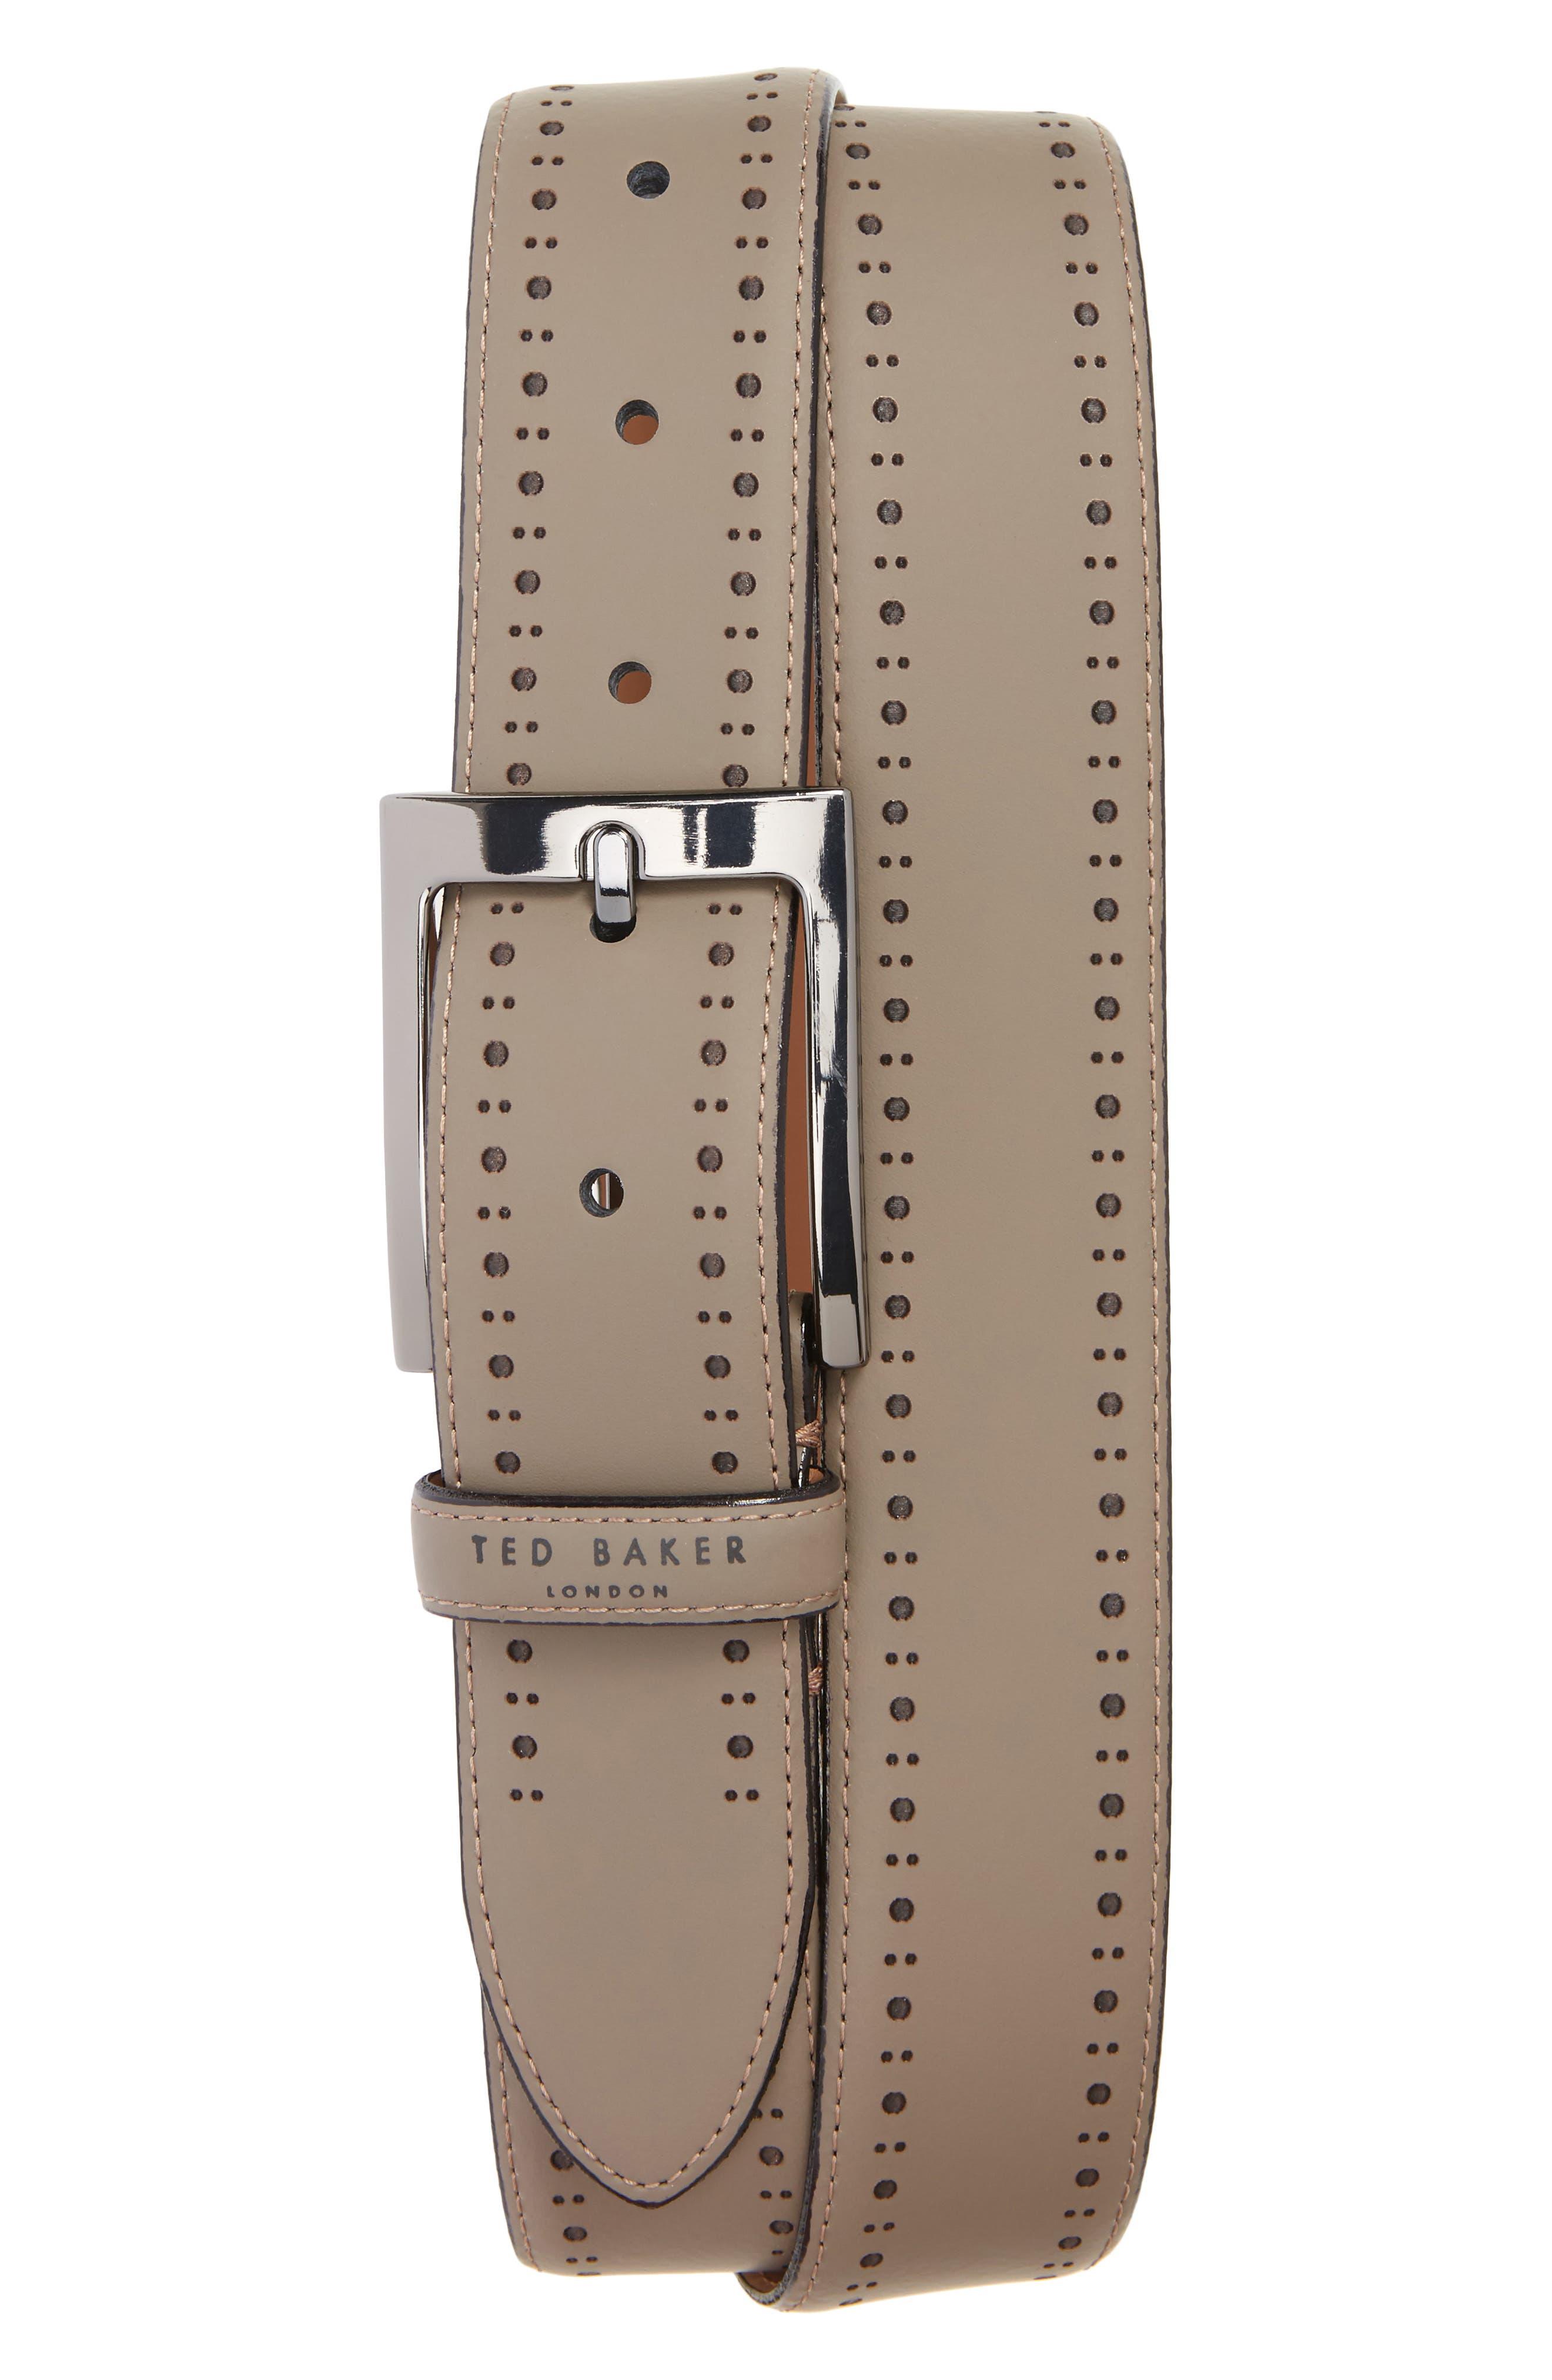 TED BAKER LONDON Havan Brogue Leather Belt, Main, color, 030